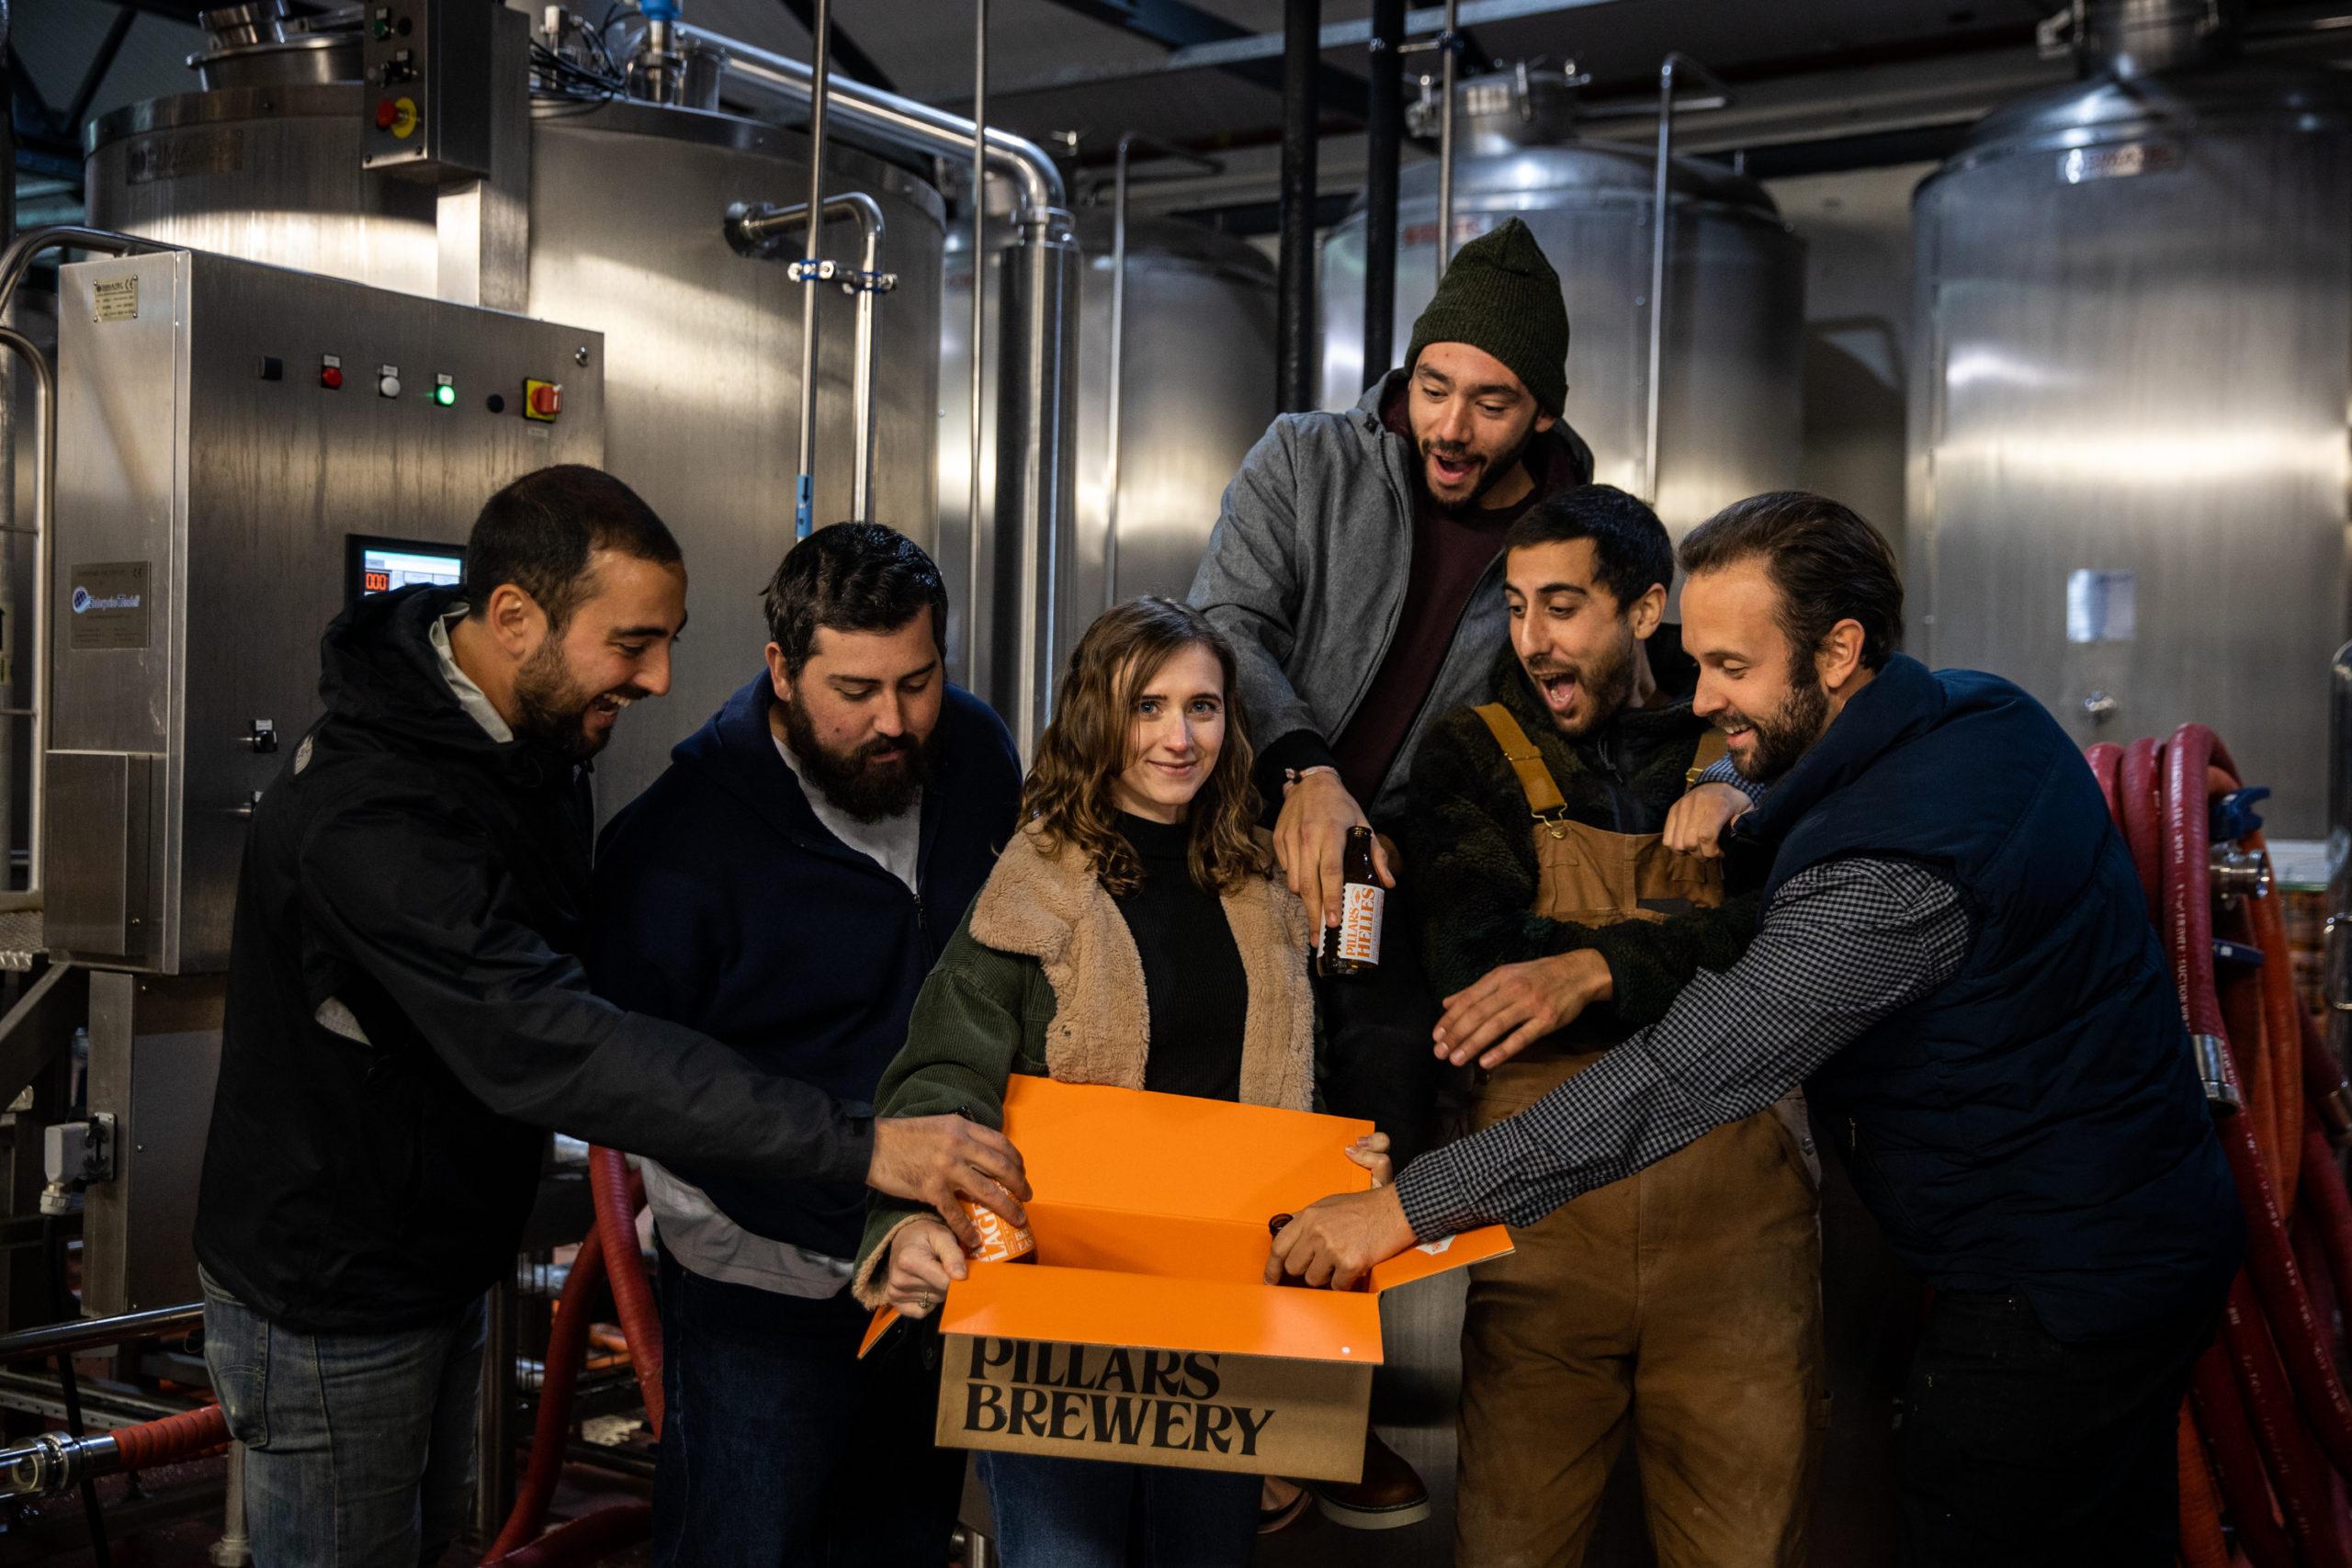 Pillar's Brewery si rifà il look: l'intervista a Alex e Gavin!